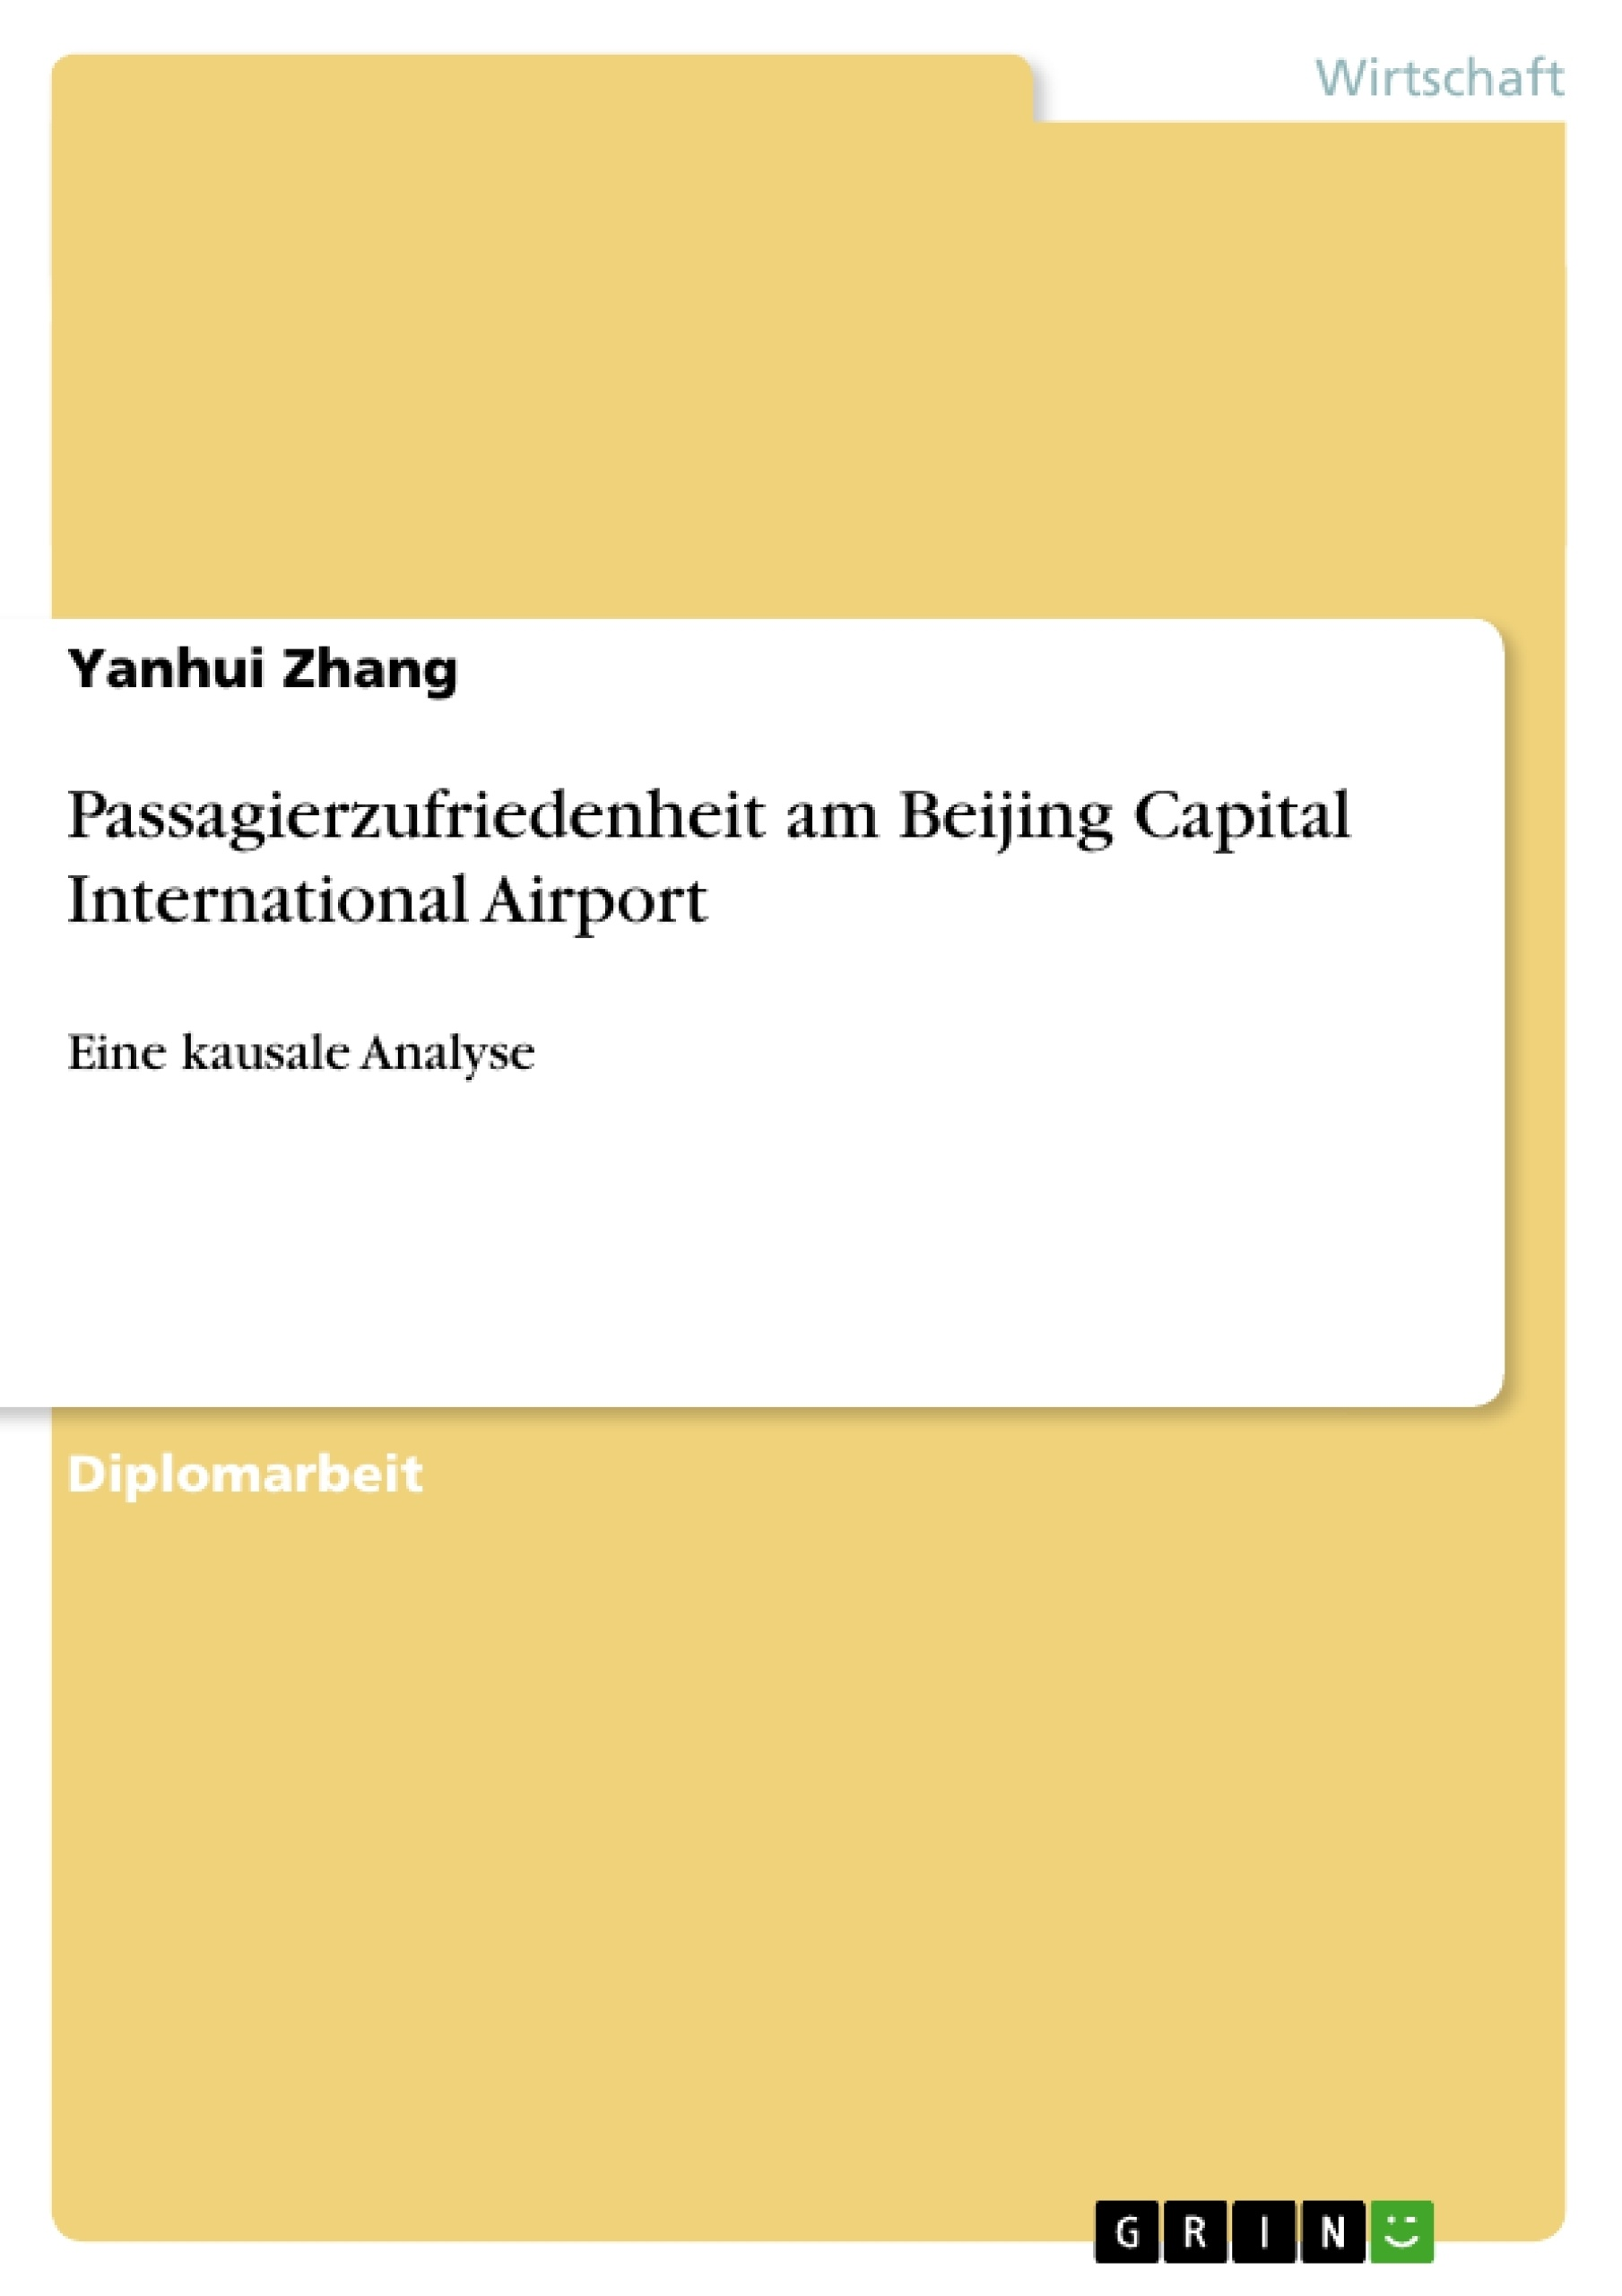 Titel: Passagierzufriedenheit am Beijing Capital International Airport